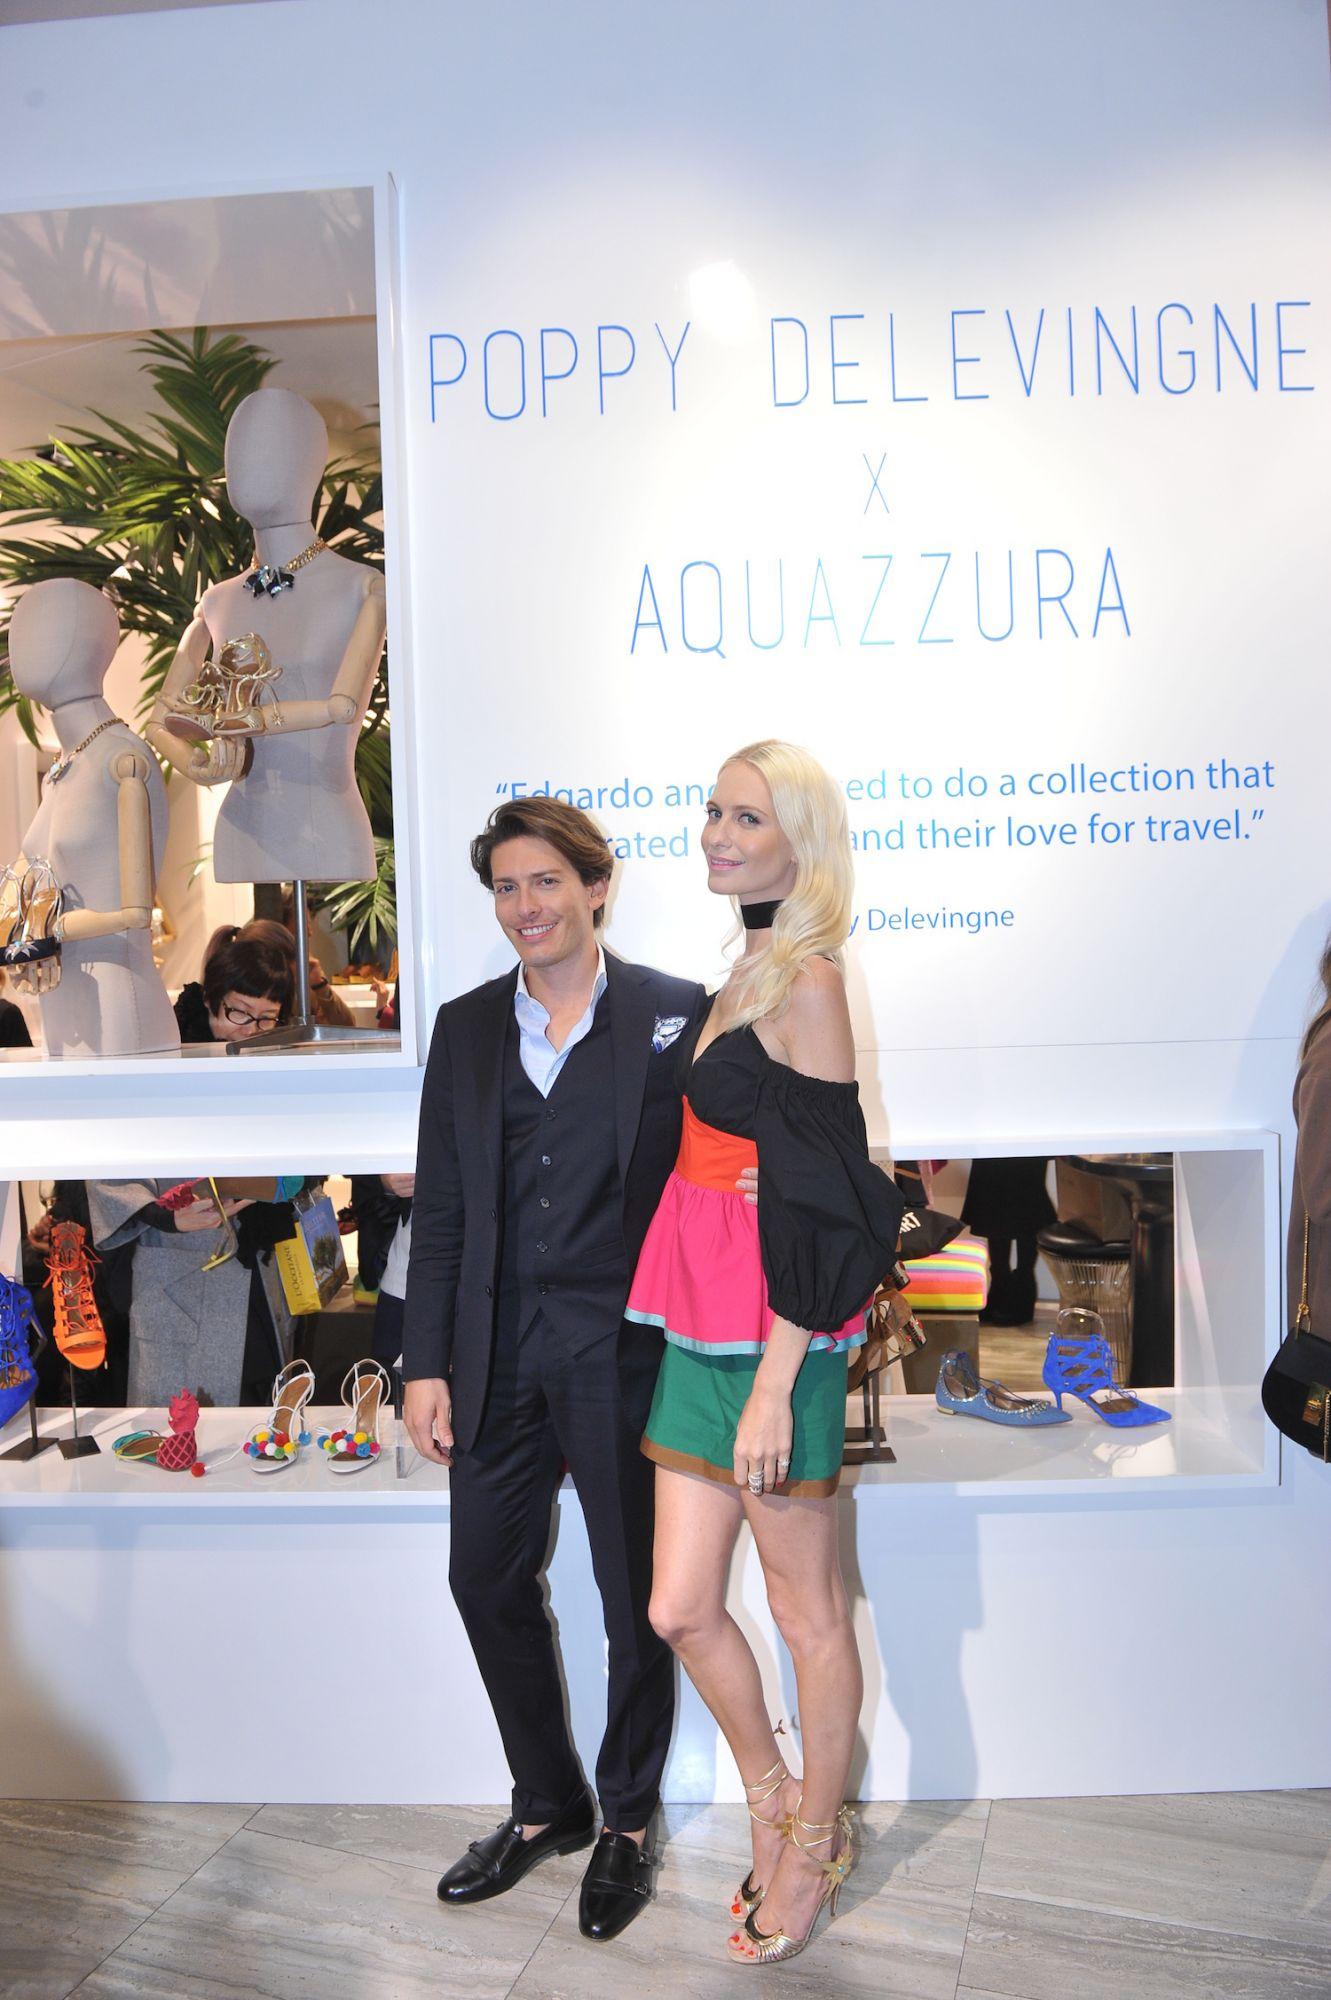 Edgardo Osorio and Poppy Delevingne